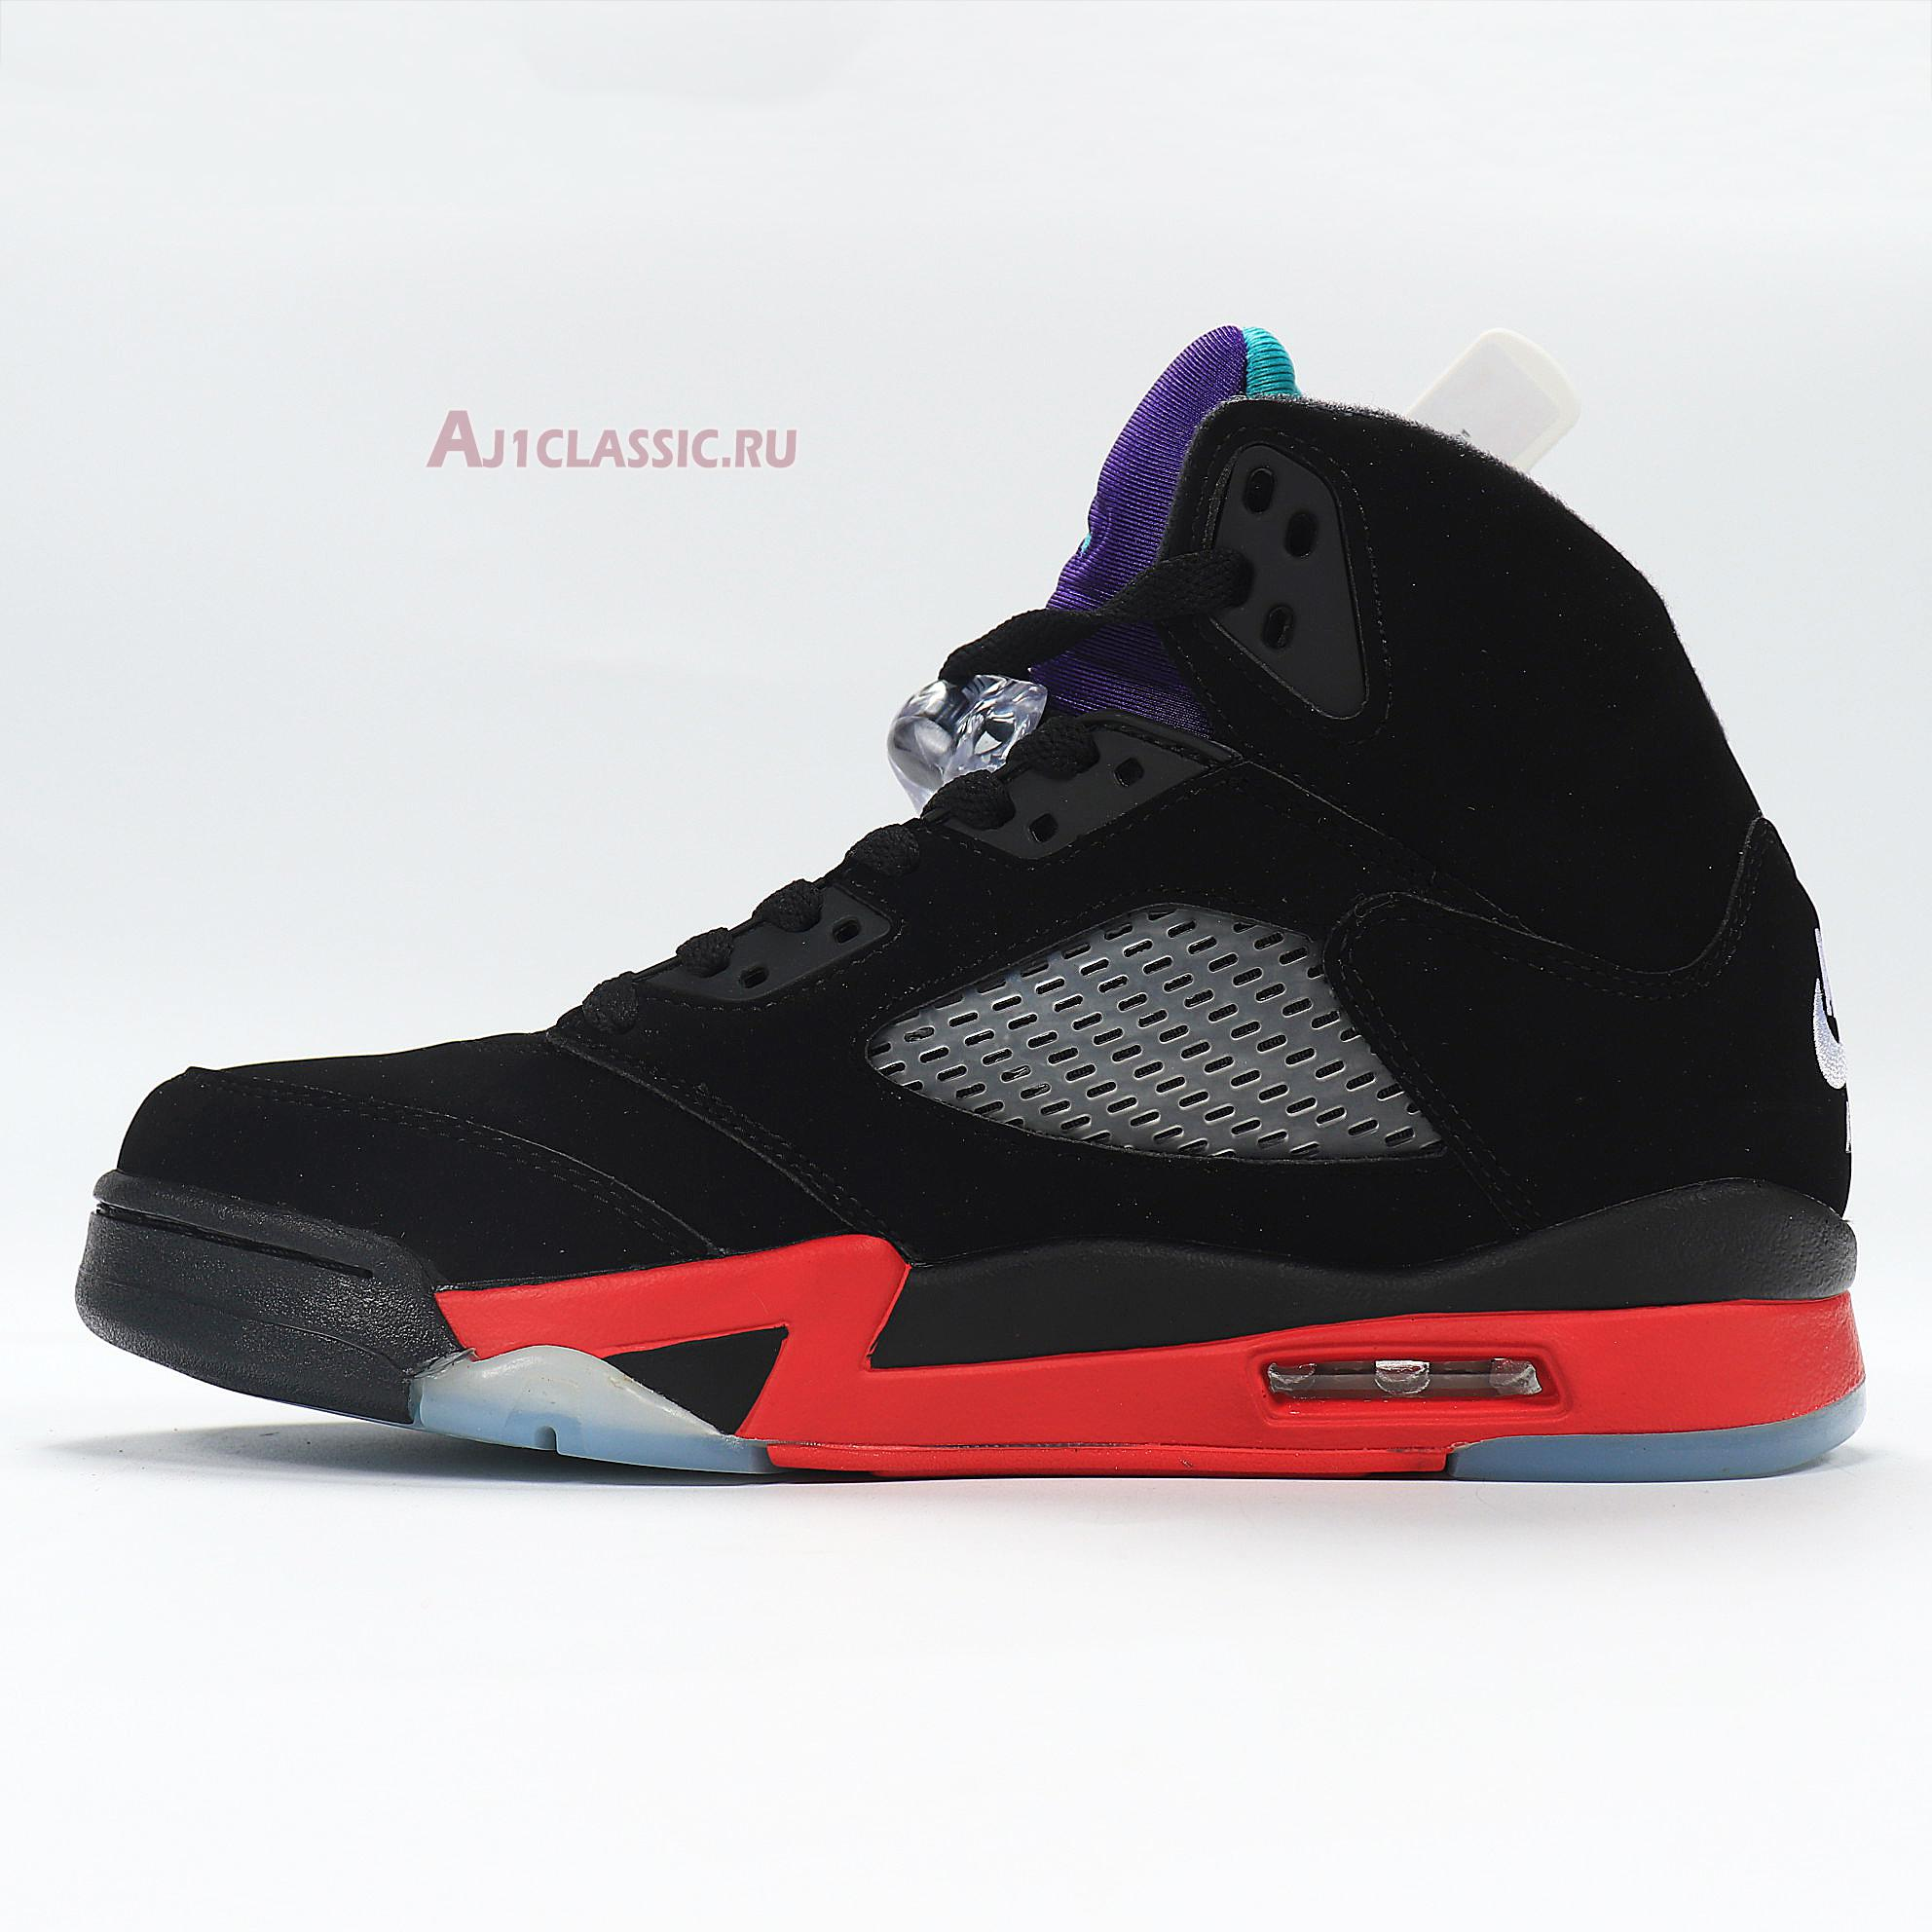 "Air Jordan 5 Retro ""Top 3"" CZ1786-001"